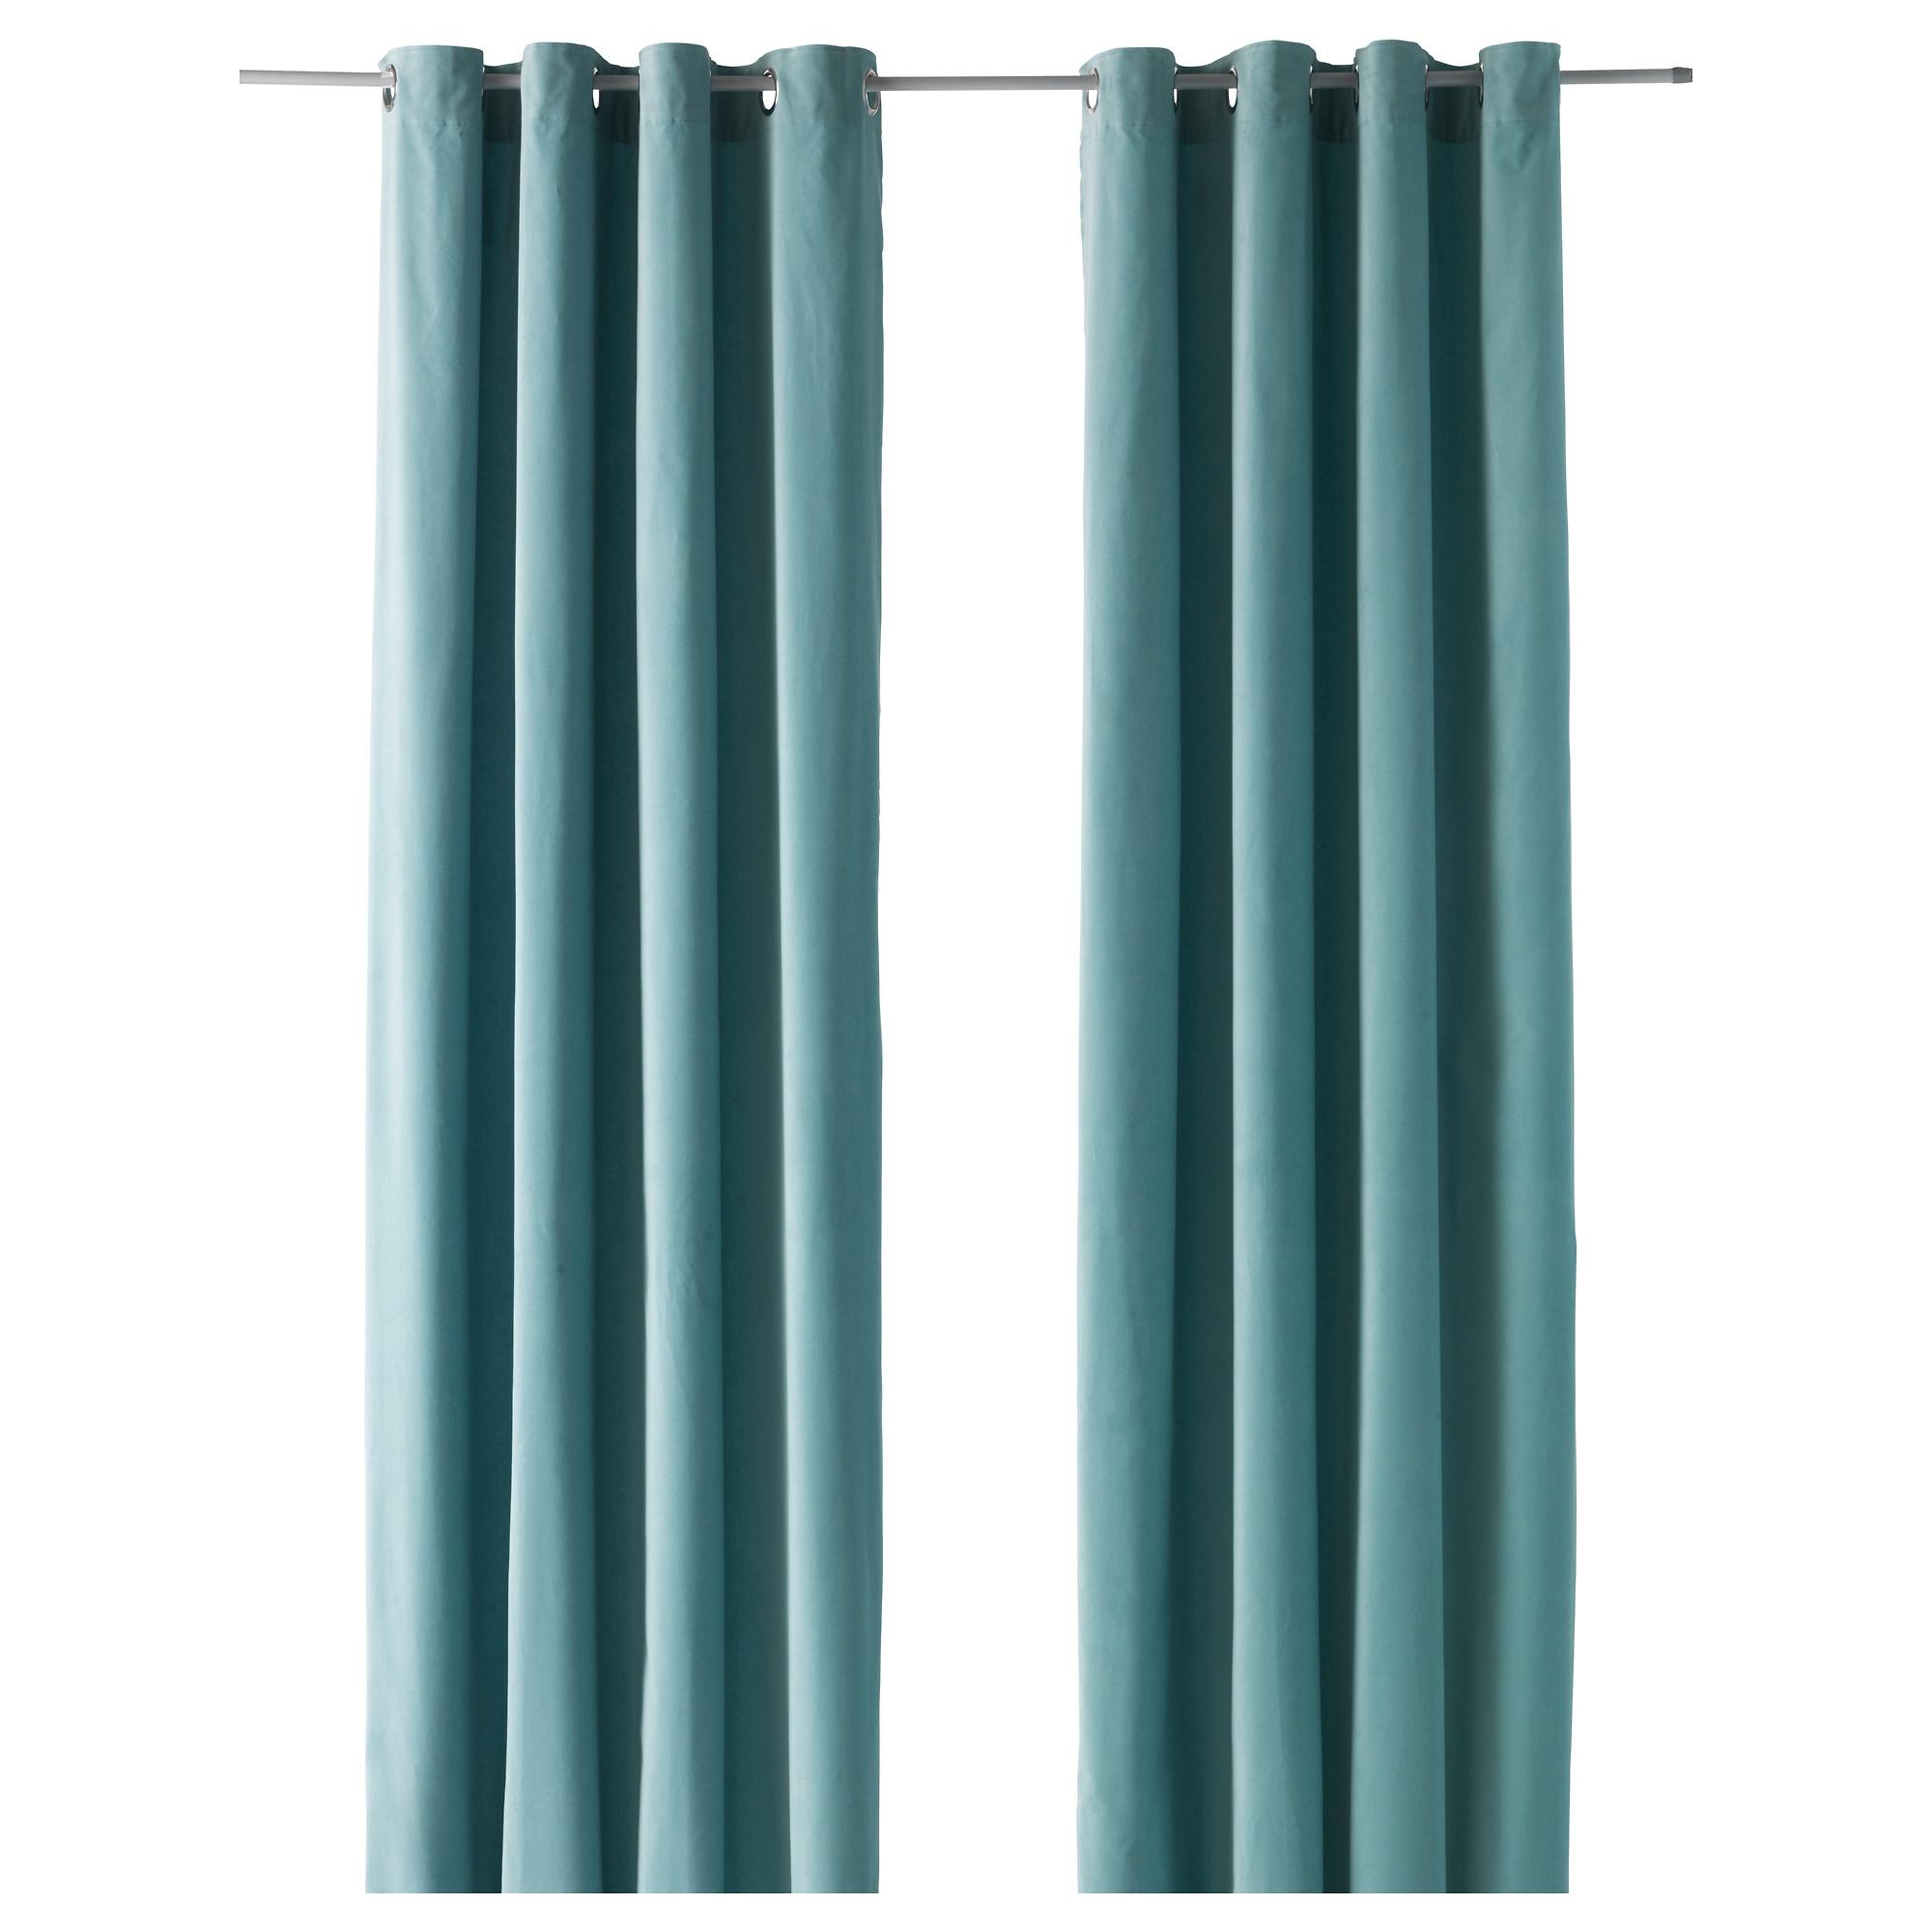 Sanela par de cortinas turquesa - Cortinas turquesa ...